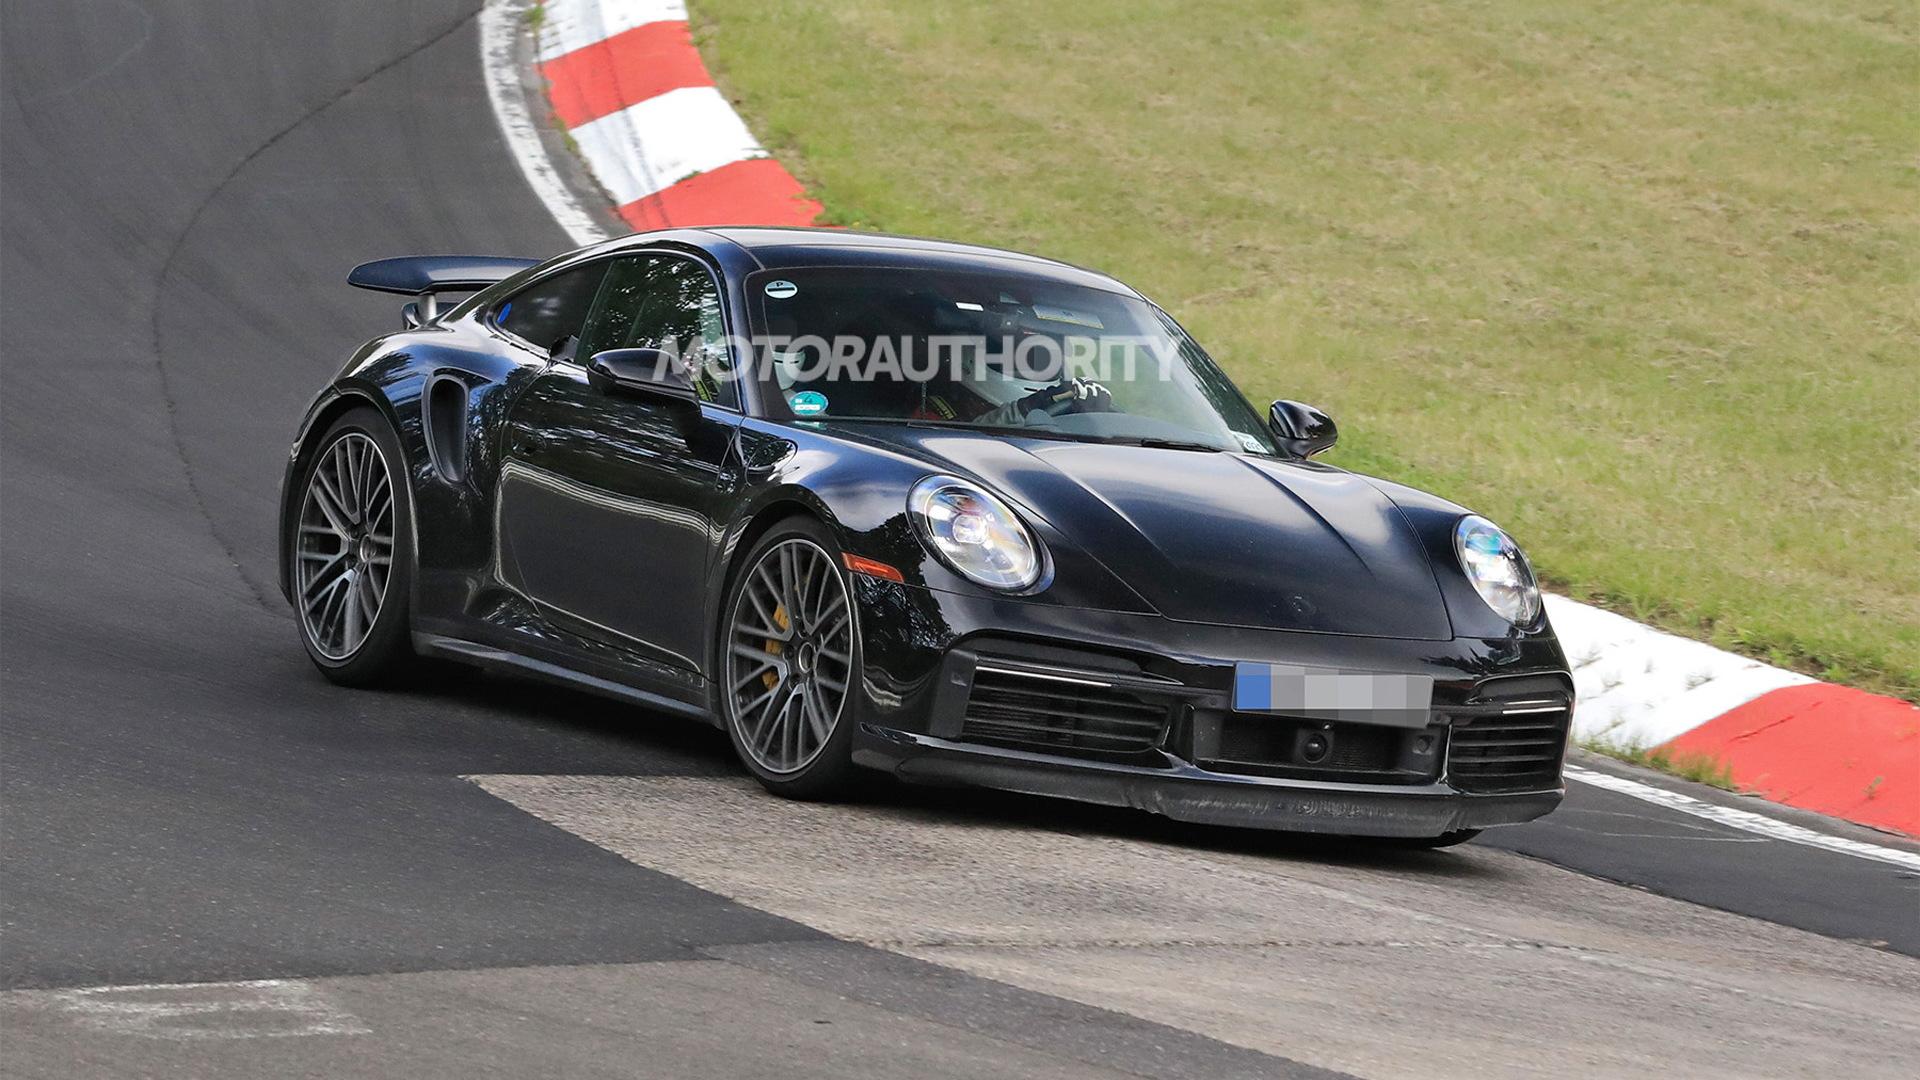 2024 Porsche 911 Turbo S E-Hybrid test mule spy shots - Photo credit:S. Baldauf/SB-Medien